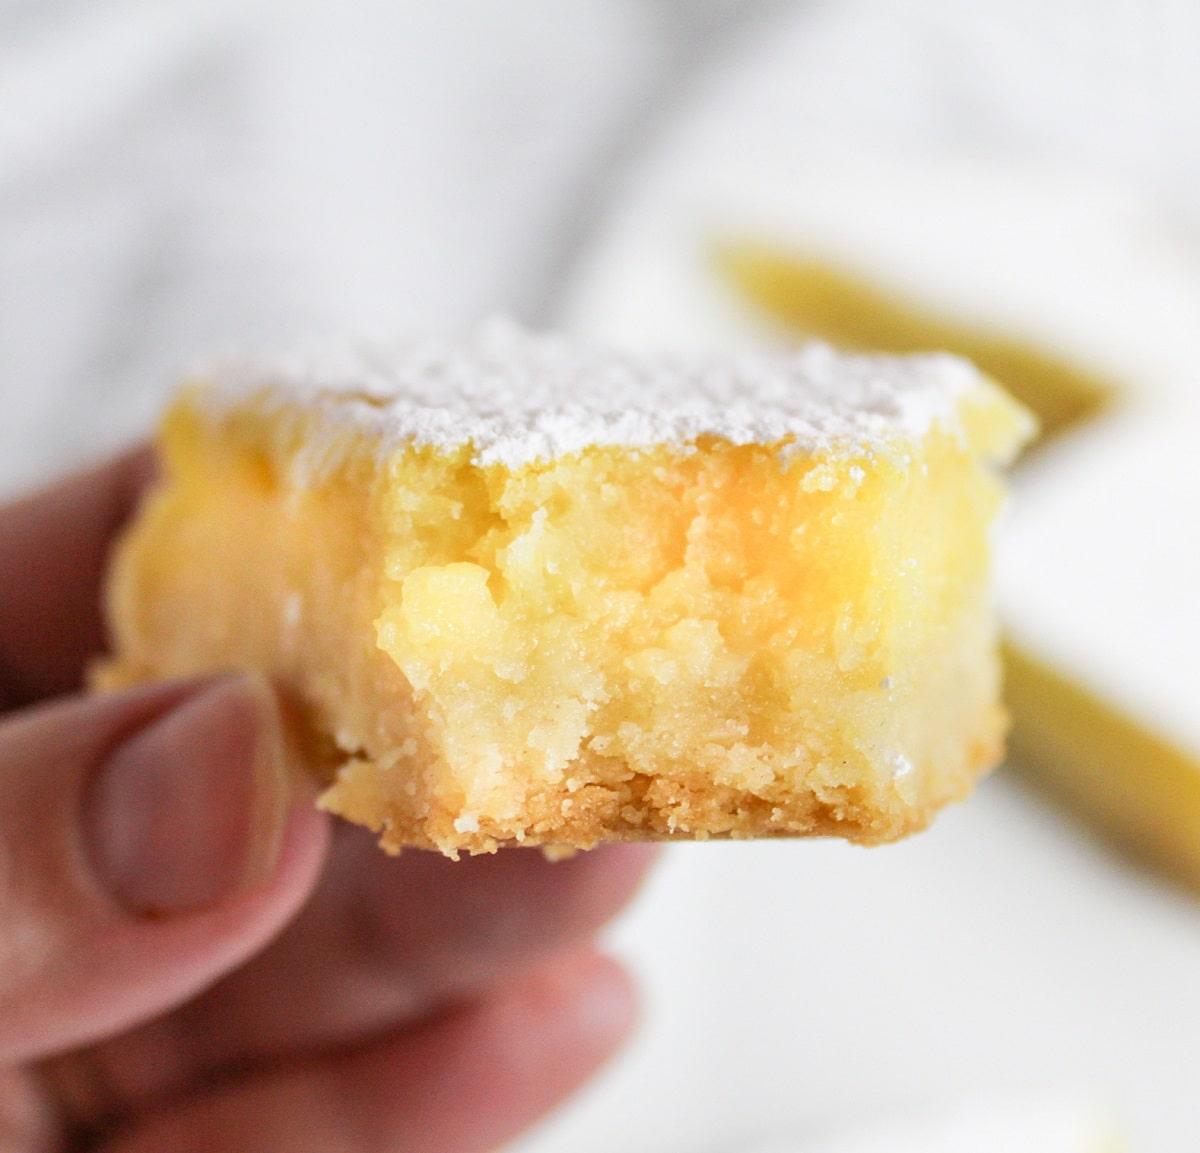 meyer lemon bar with a bite